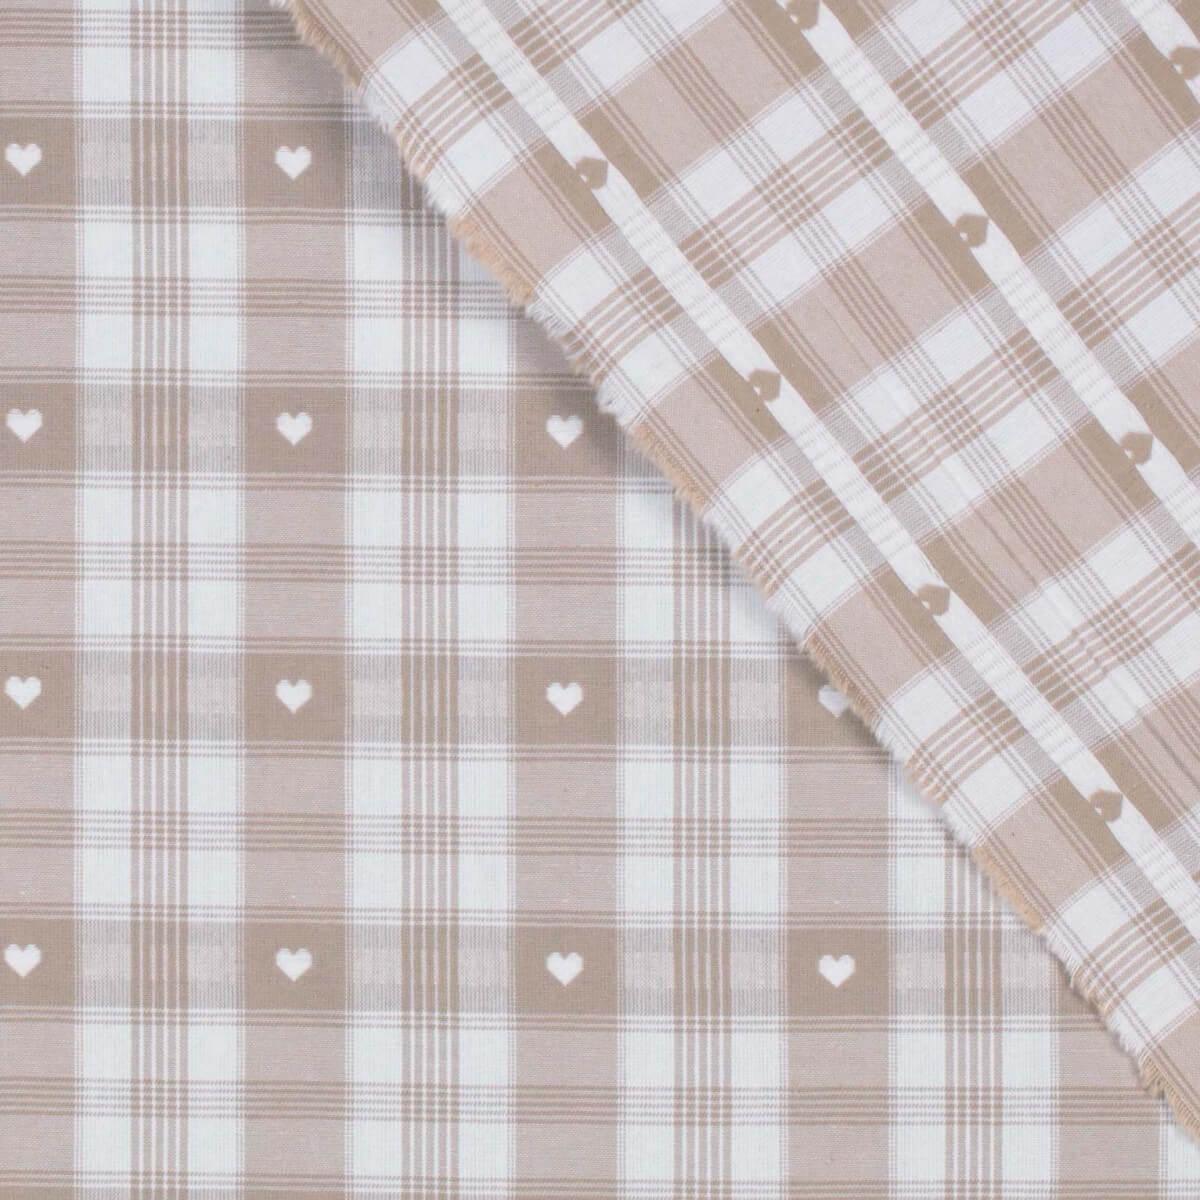 tissu coton traditionnel alsacien montagne beige. Black Bedroom Furniture Sets. Home Design Ideas